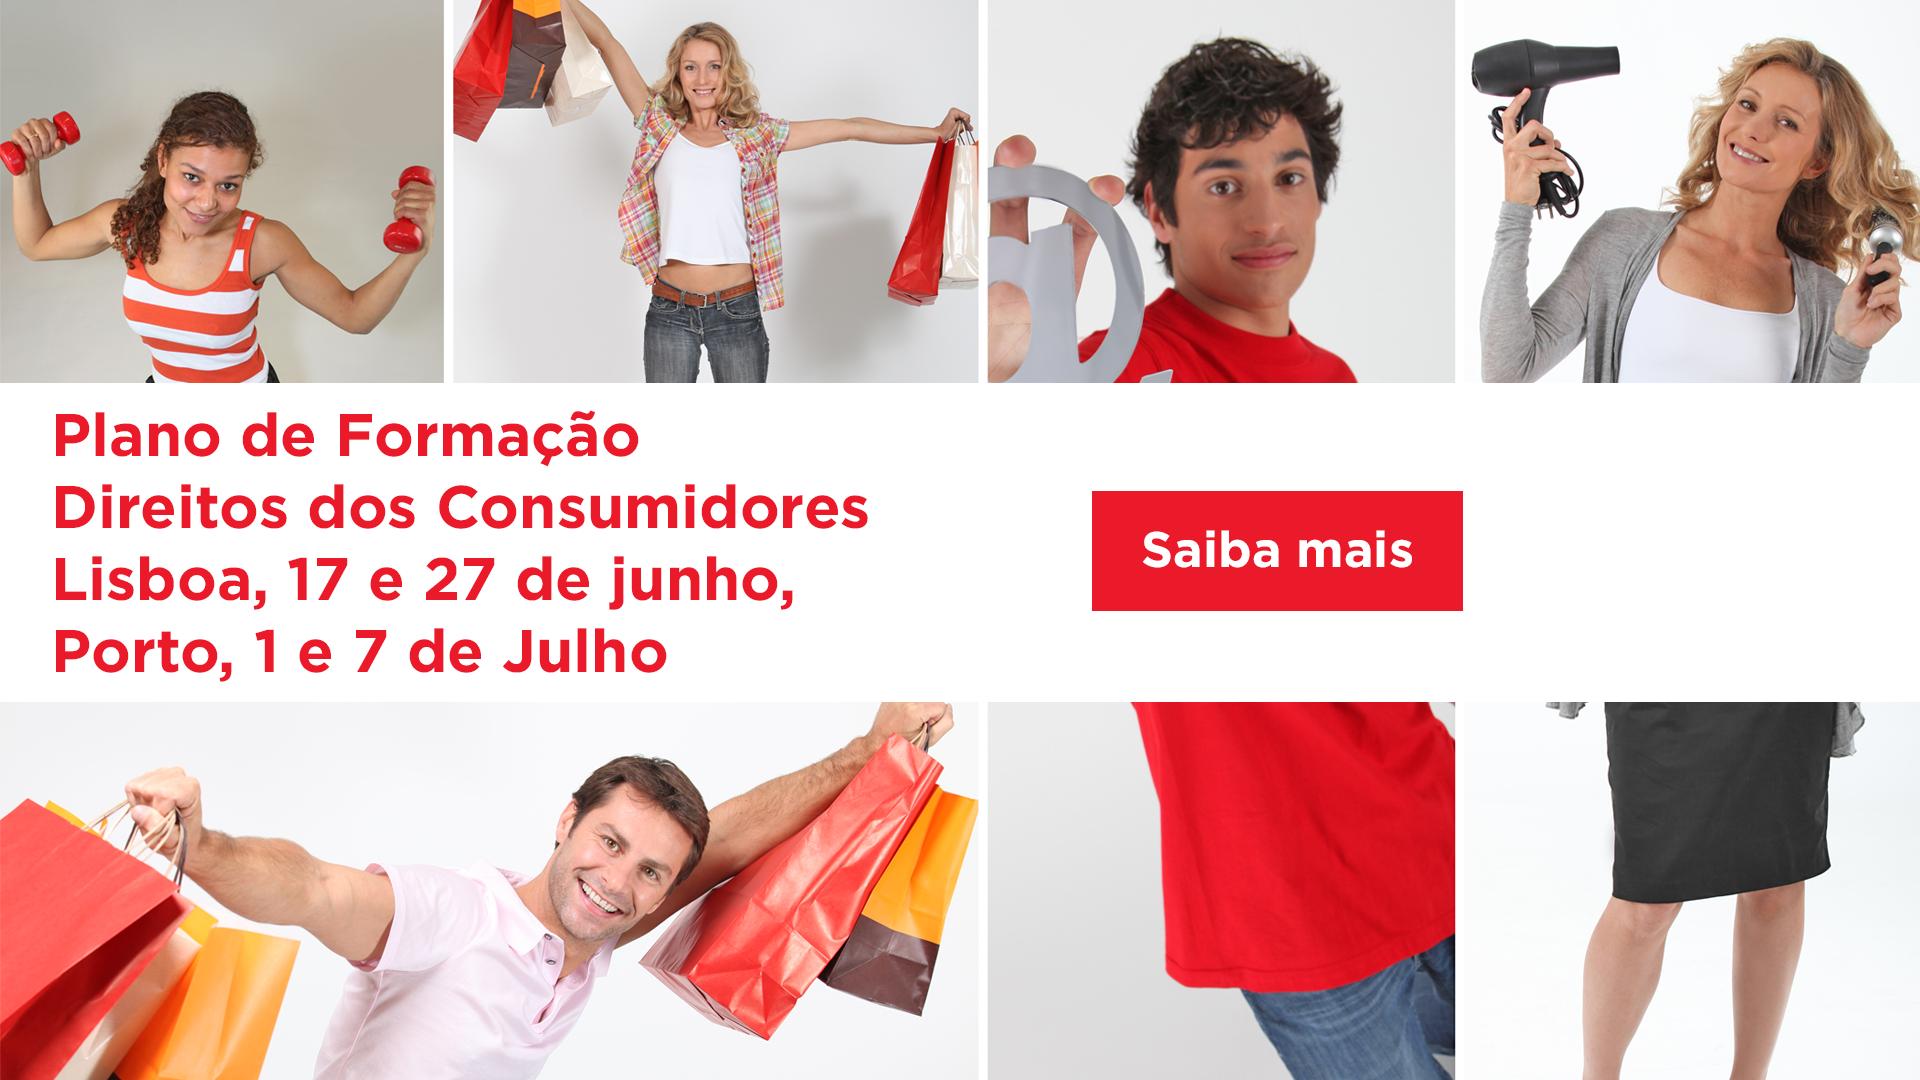 Direitos dos Consumidores